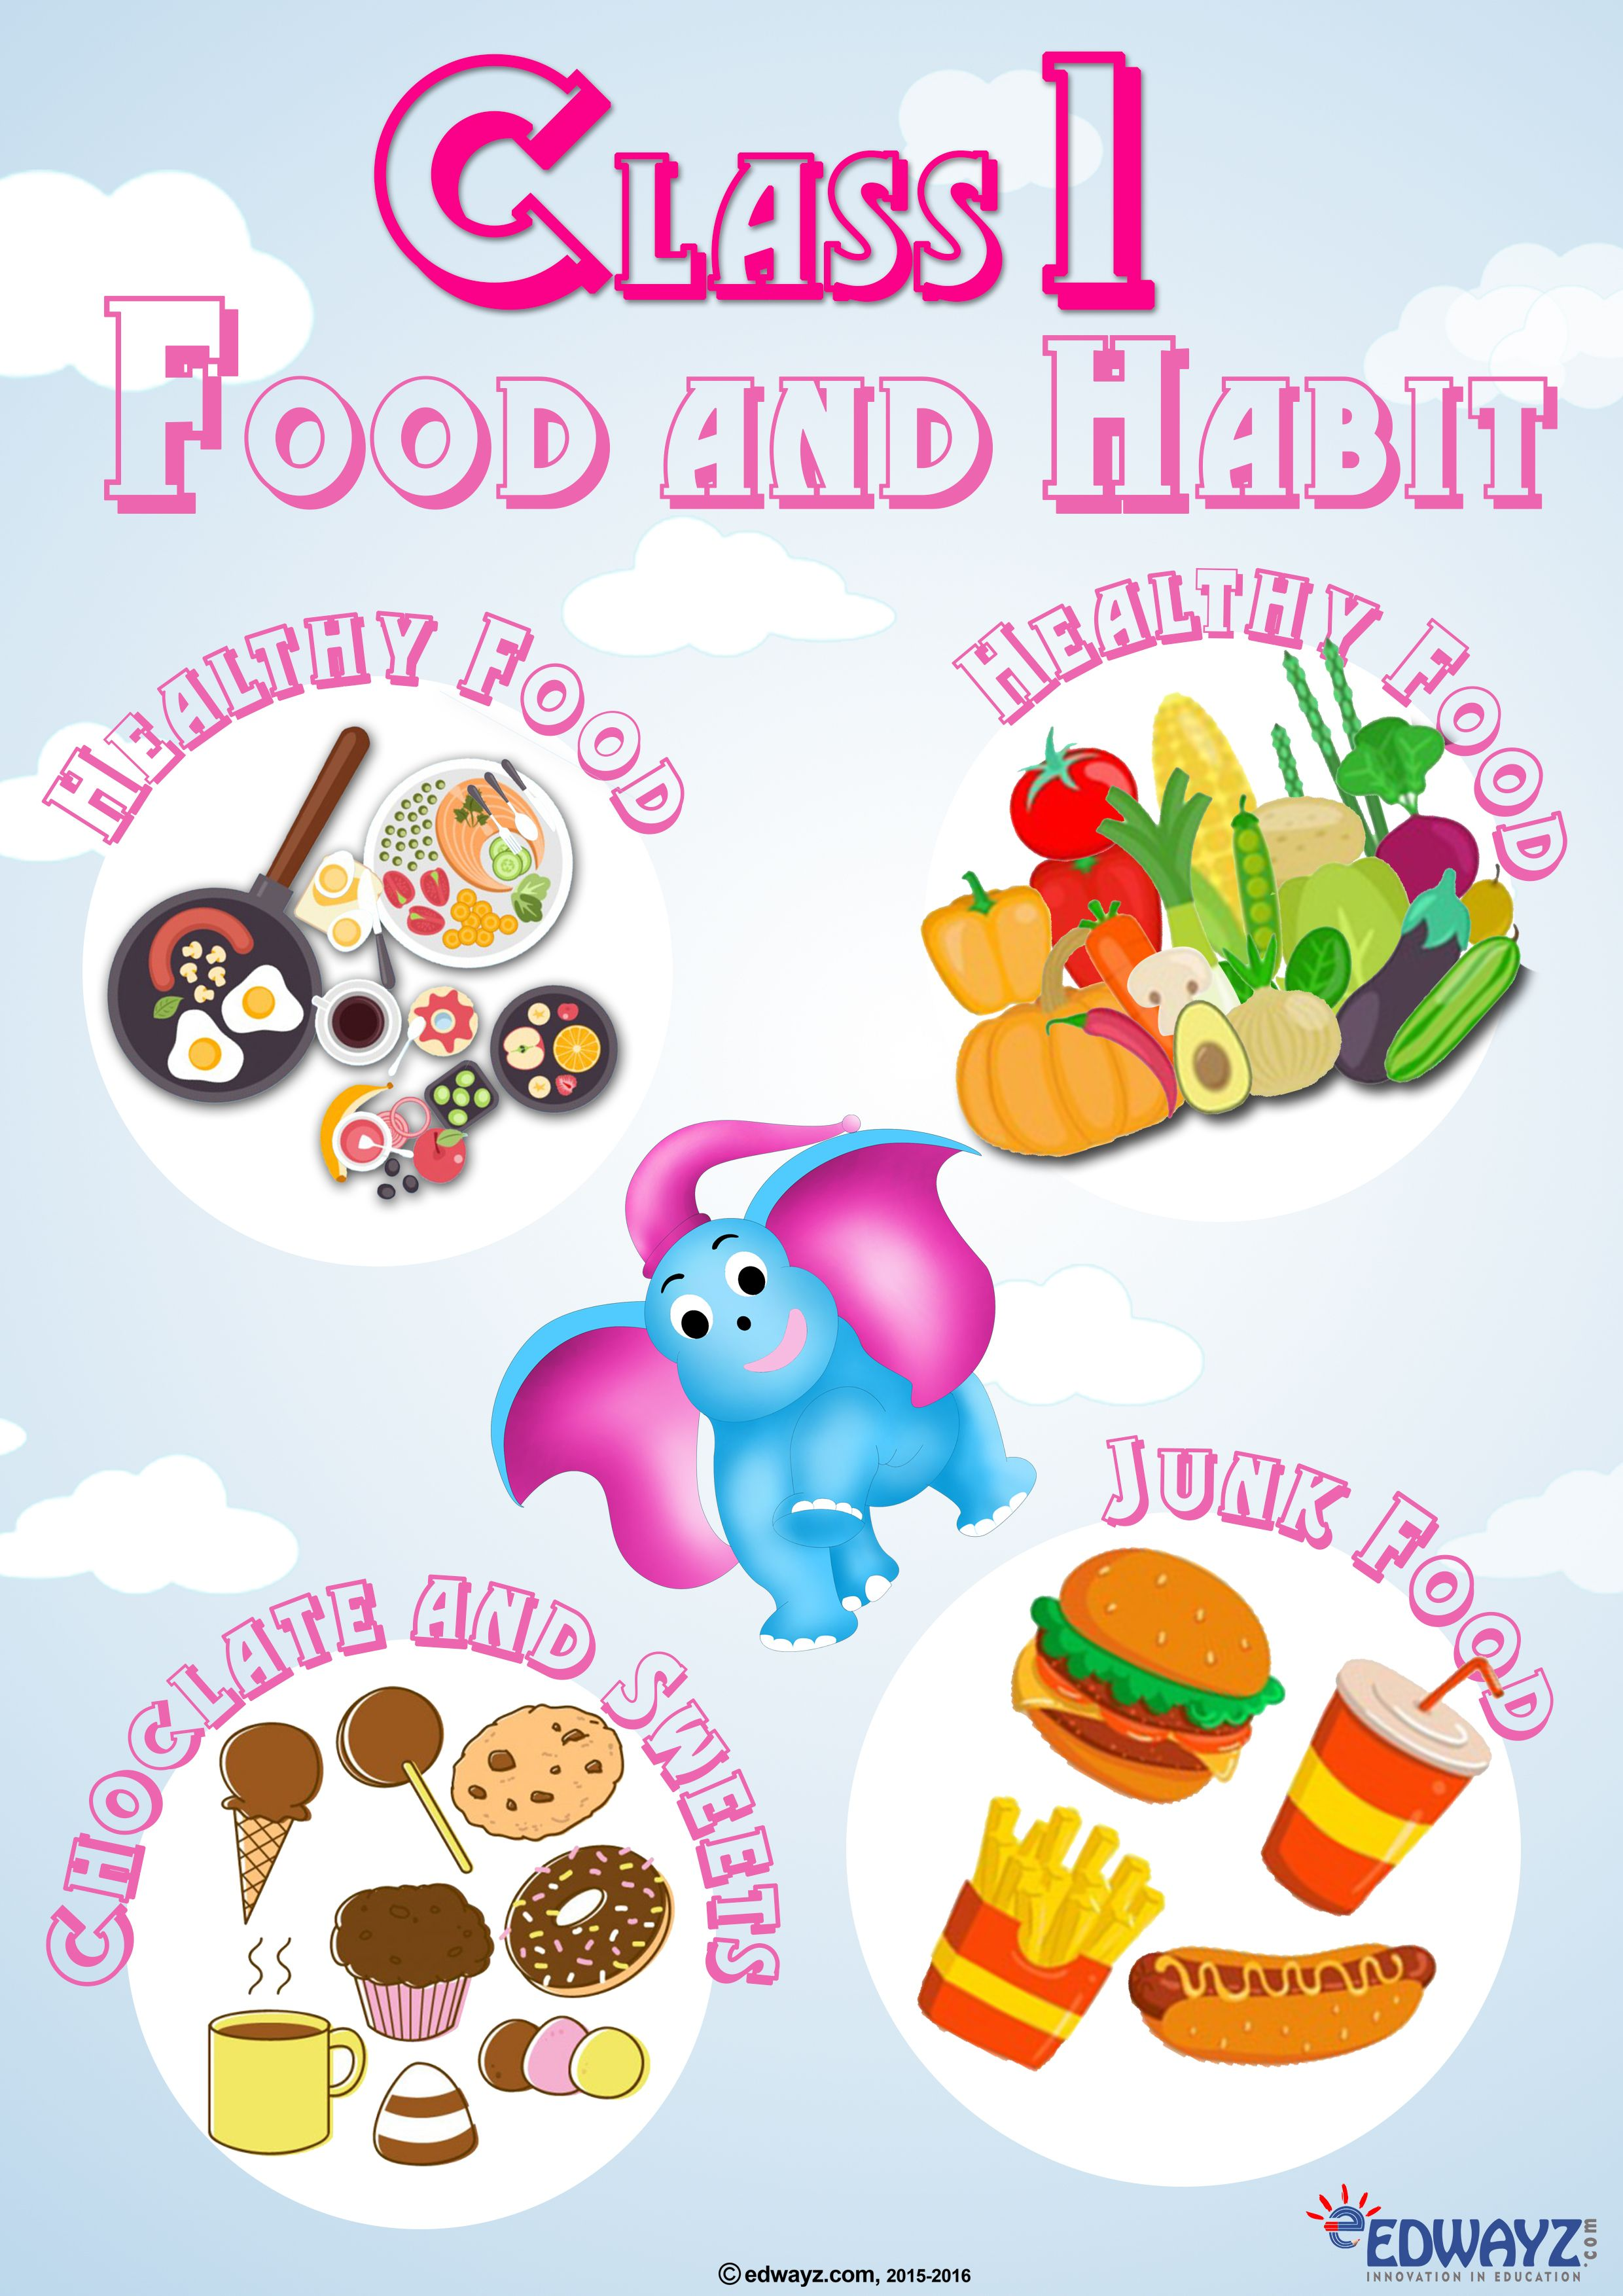 hight resolution of Worksheets_Class1_Food \u0026 habits   Worksheets for kids